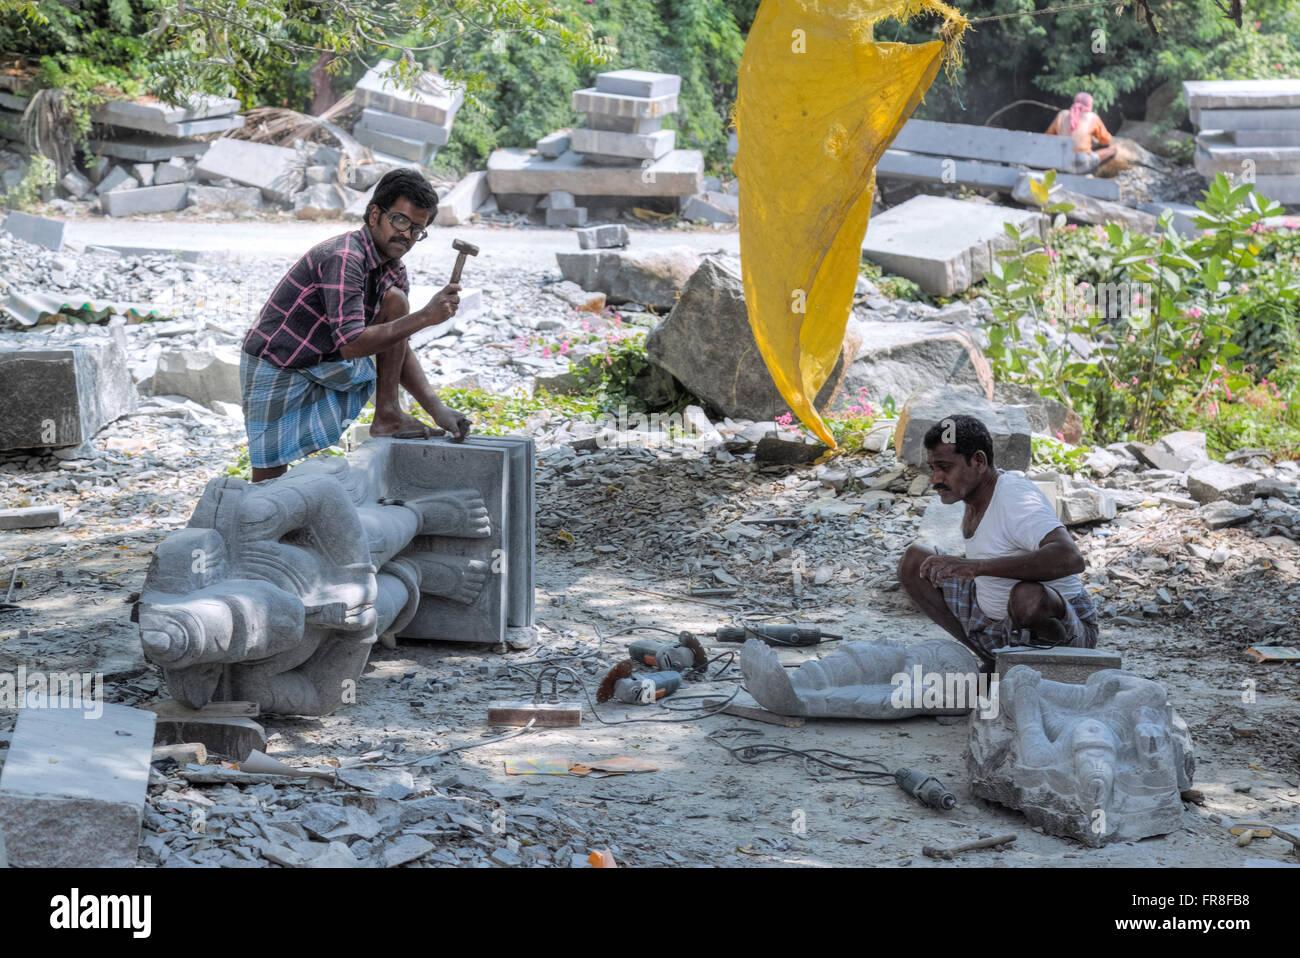 stone cutter in Mahabalipuram, Tamil Nadu, India, Asia - Stock Image